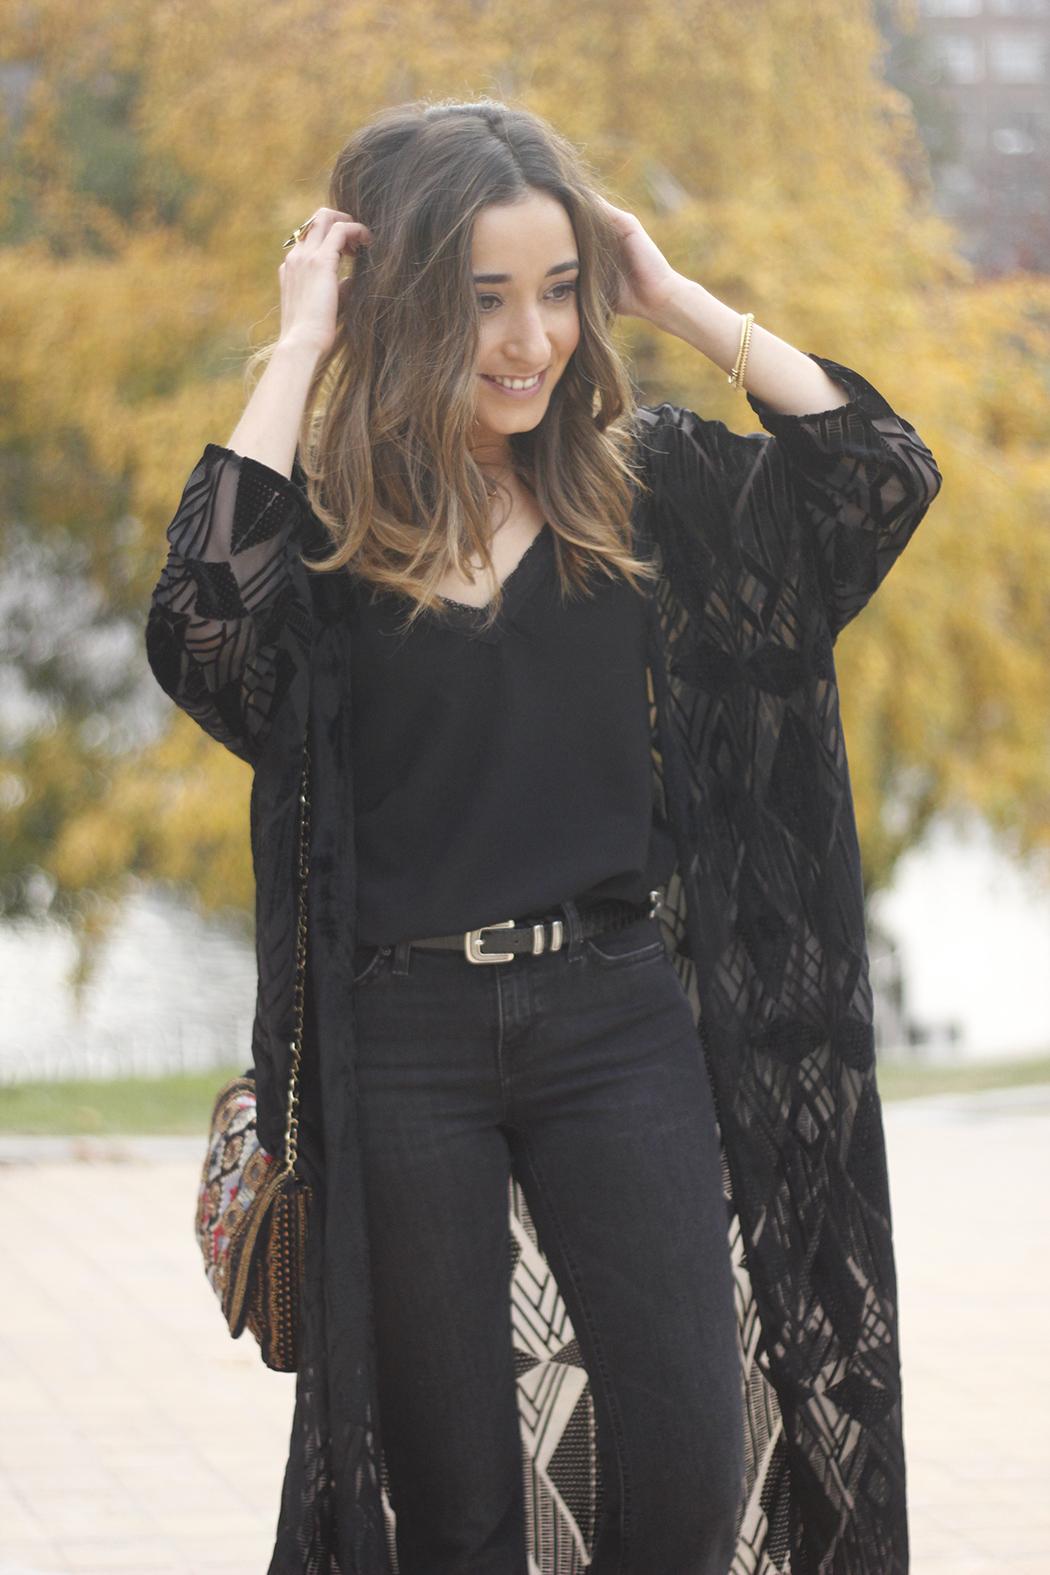 Black Kimono Black flared jeans outfit21